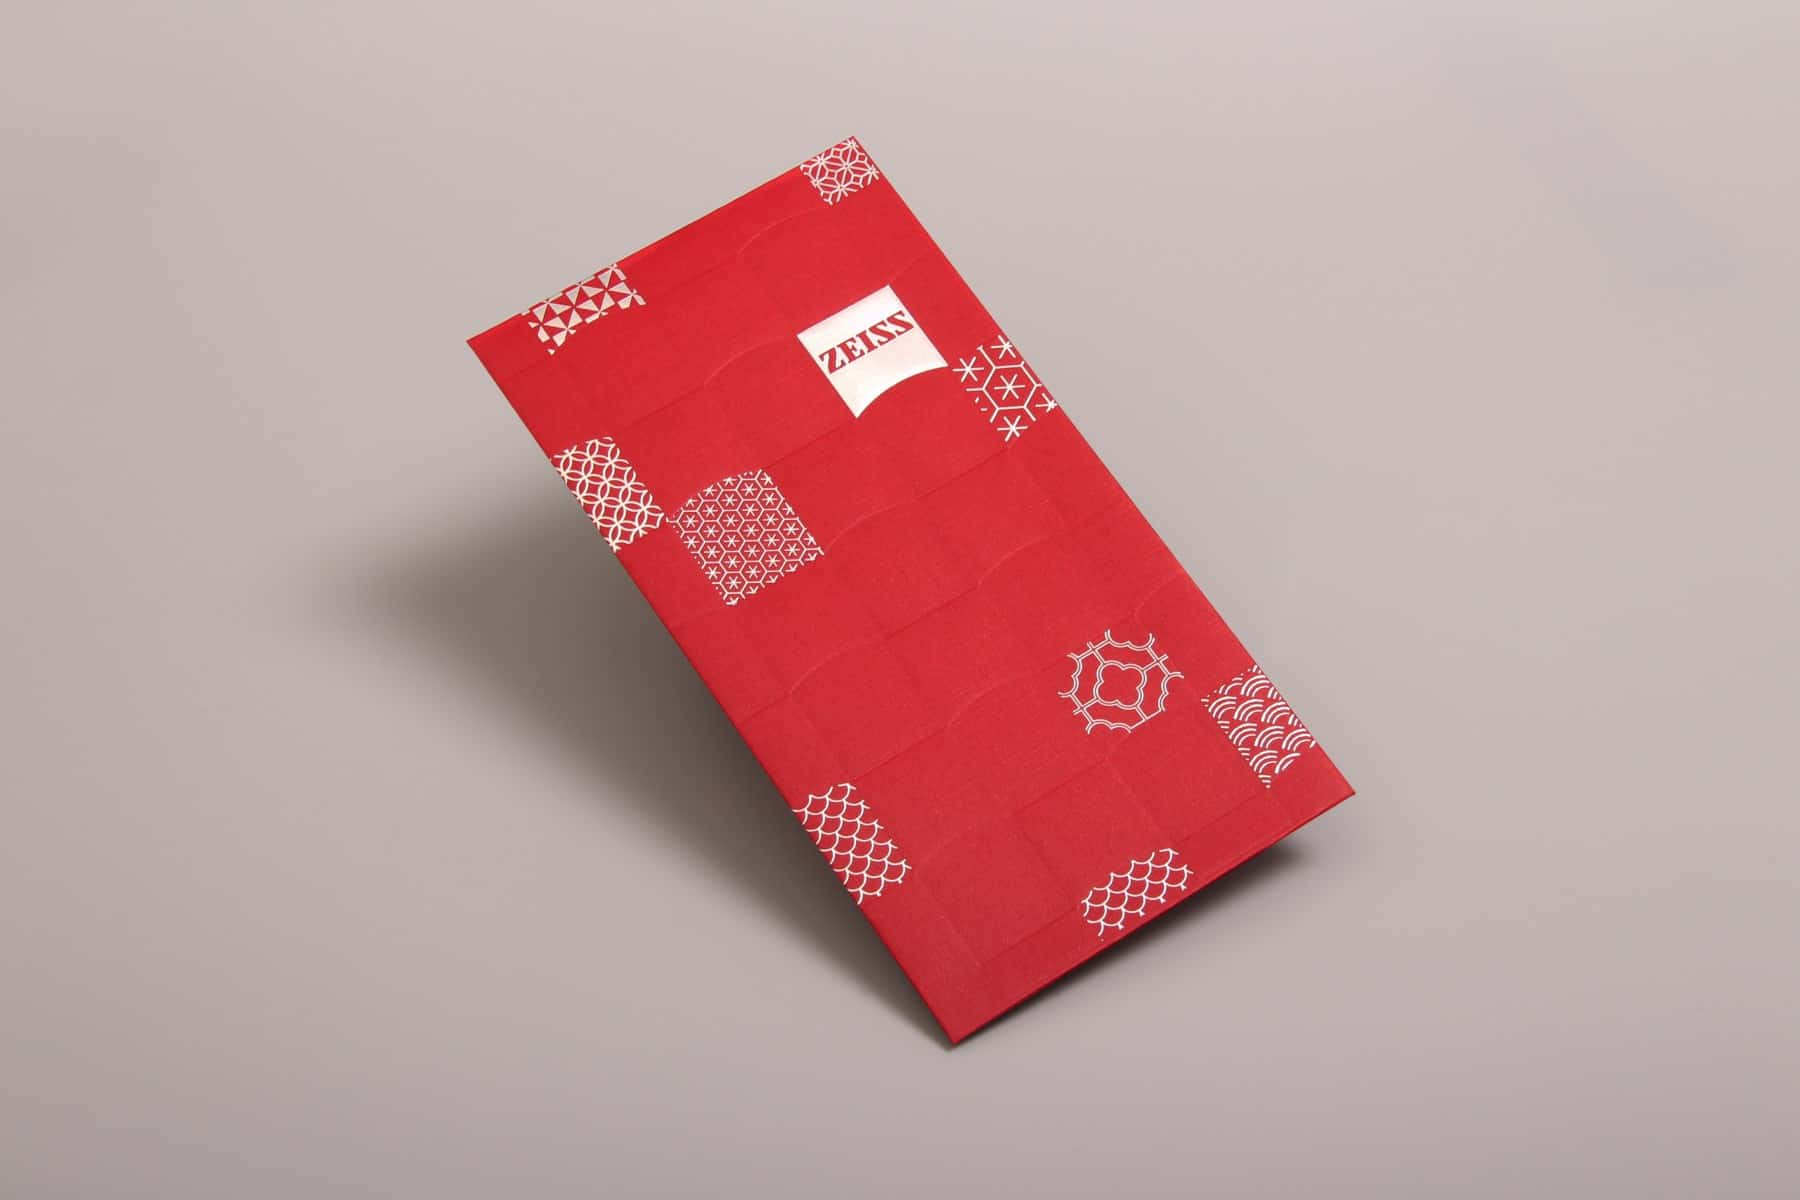 ZEISS Red Pocket Design